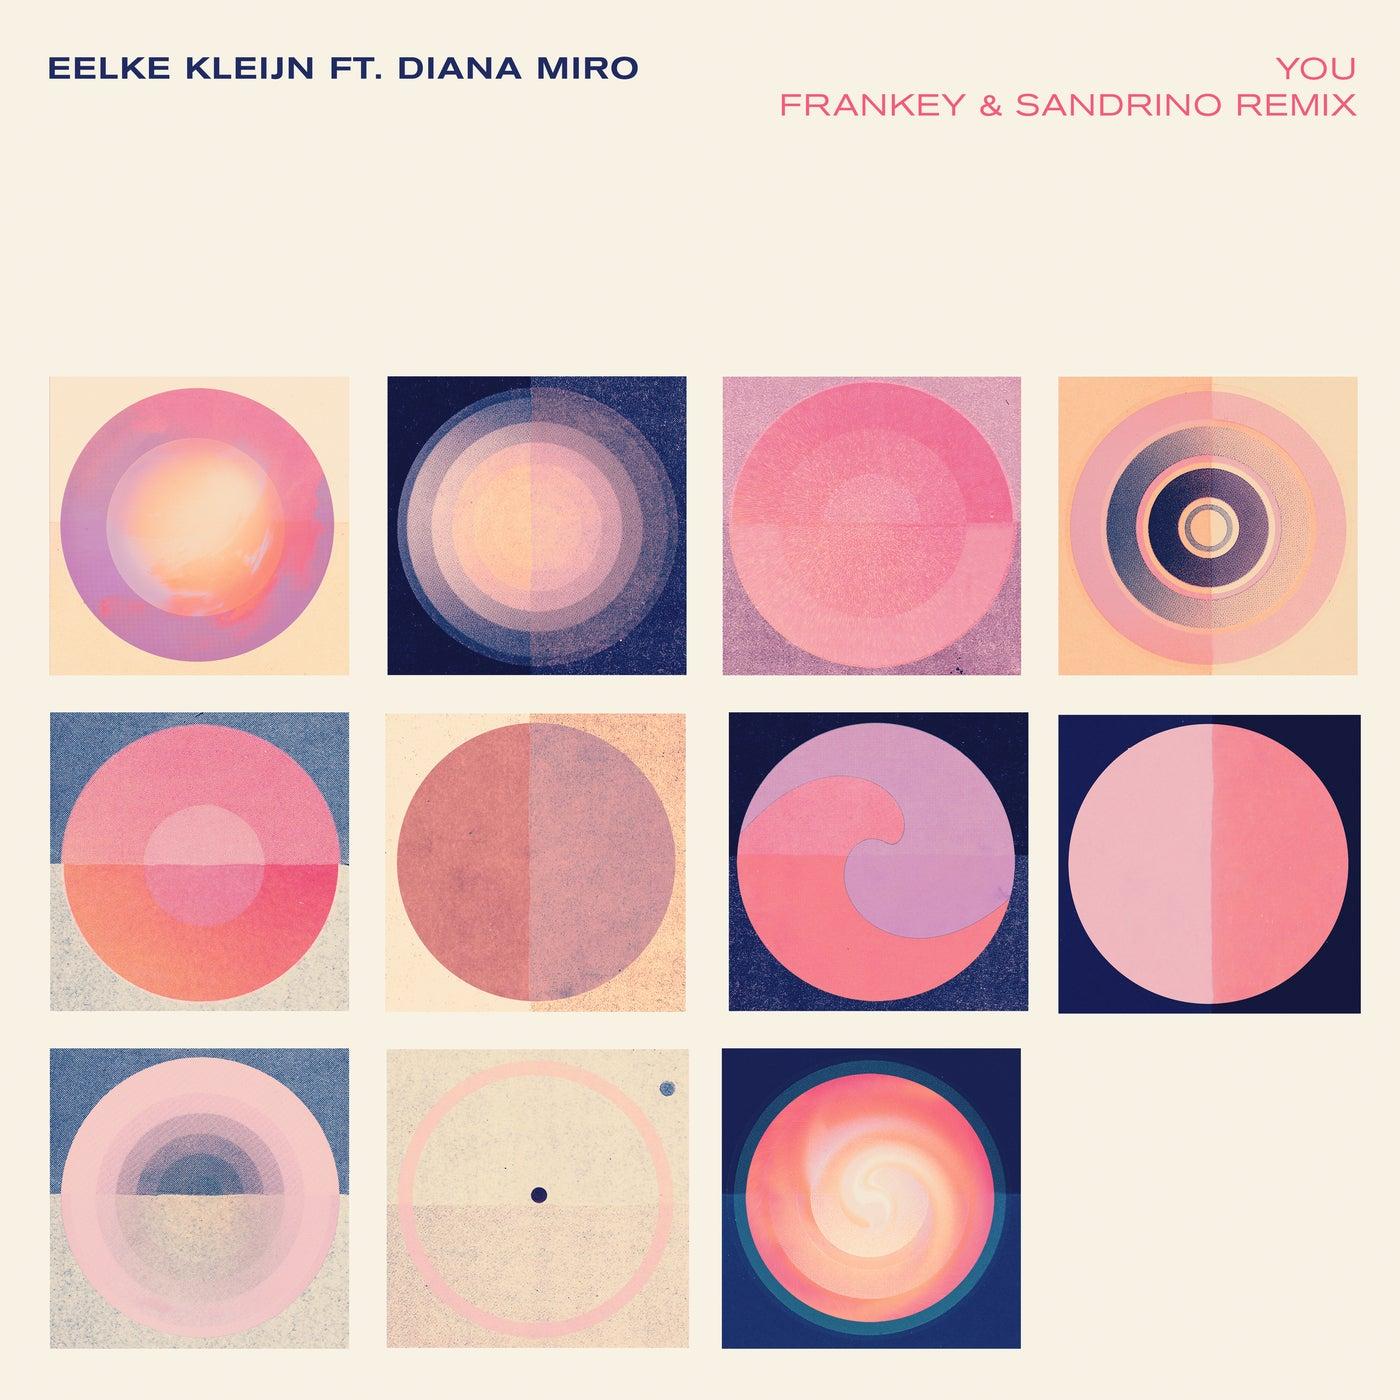 You feat. Diana Miro (Frankey & Sandrino Extended Remix)